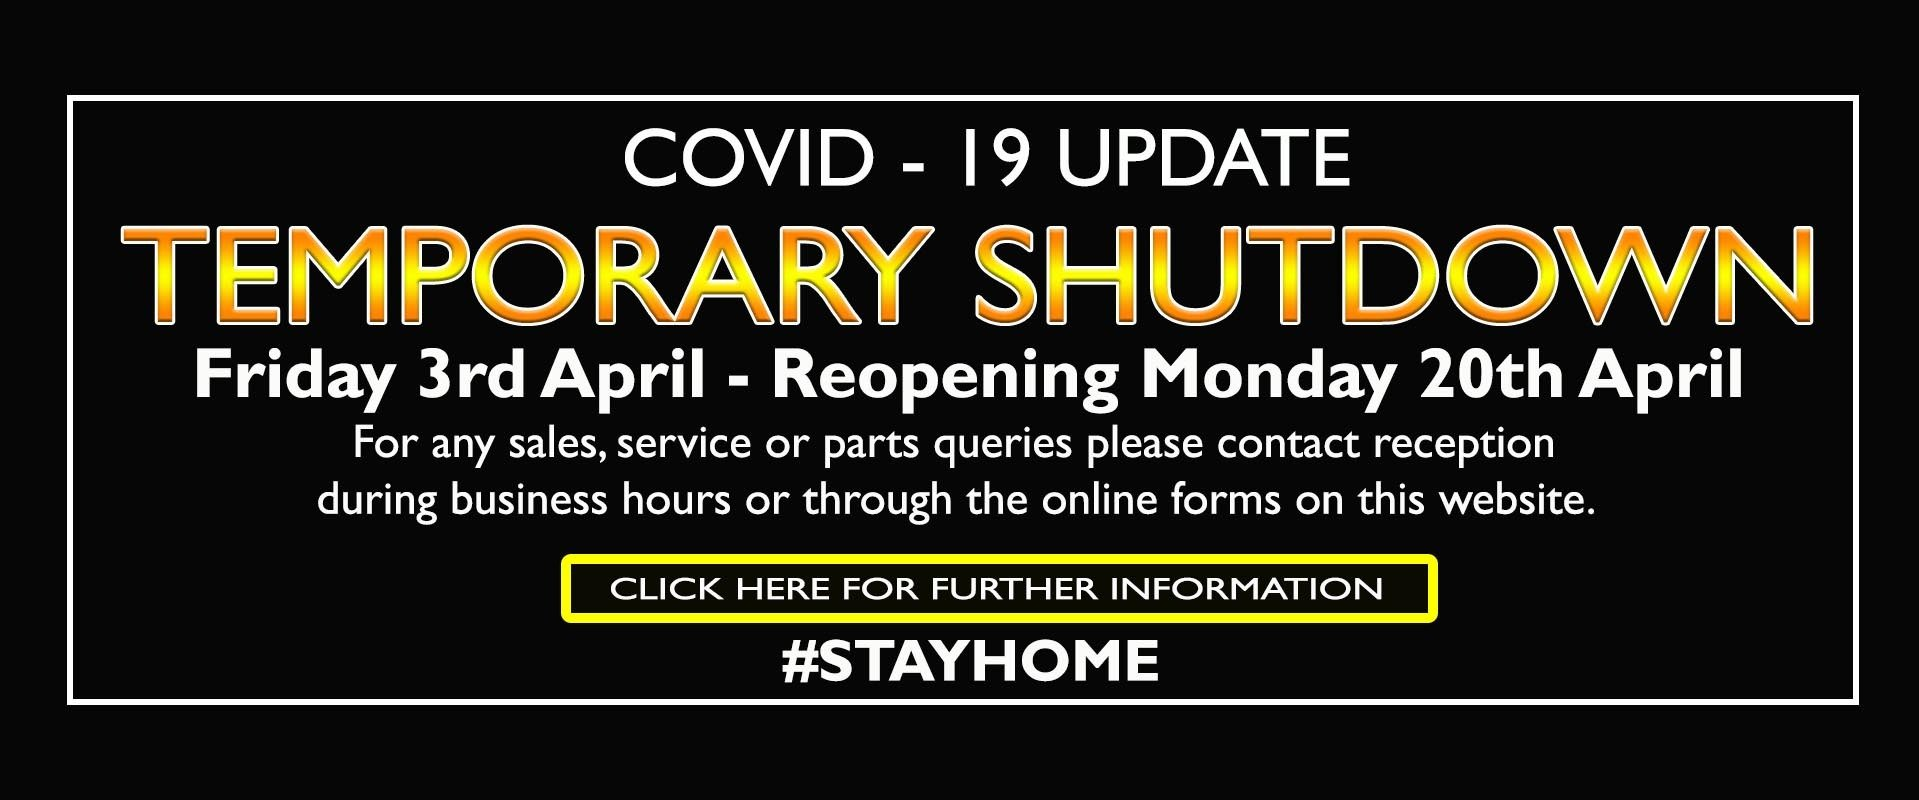 COVID19 update banner